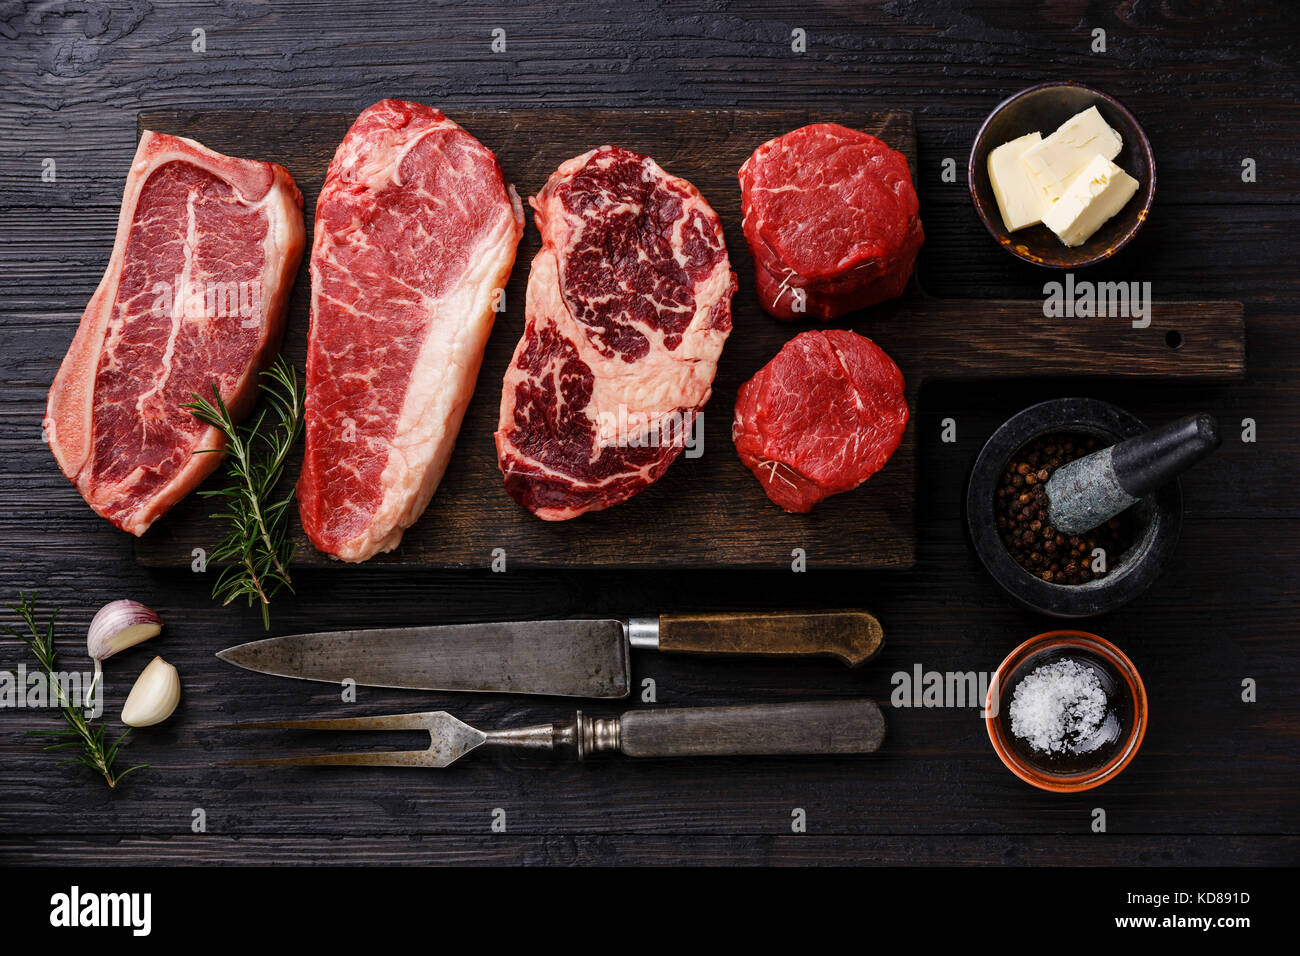 Variety of Raw Black Angus Prime meat steaks Blade on bone, Striploin, Rib eye, Tenderloin fillet mignon on wooden - Stock Image